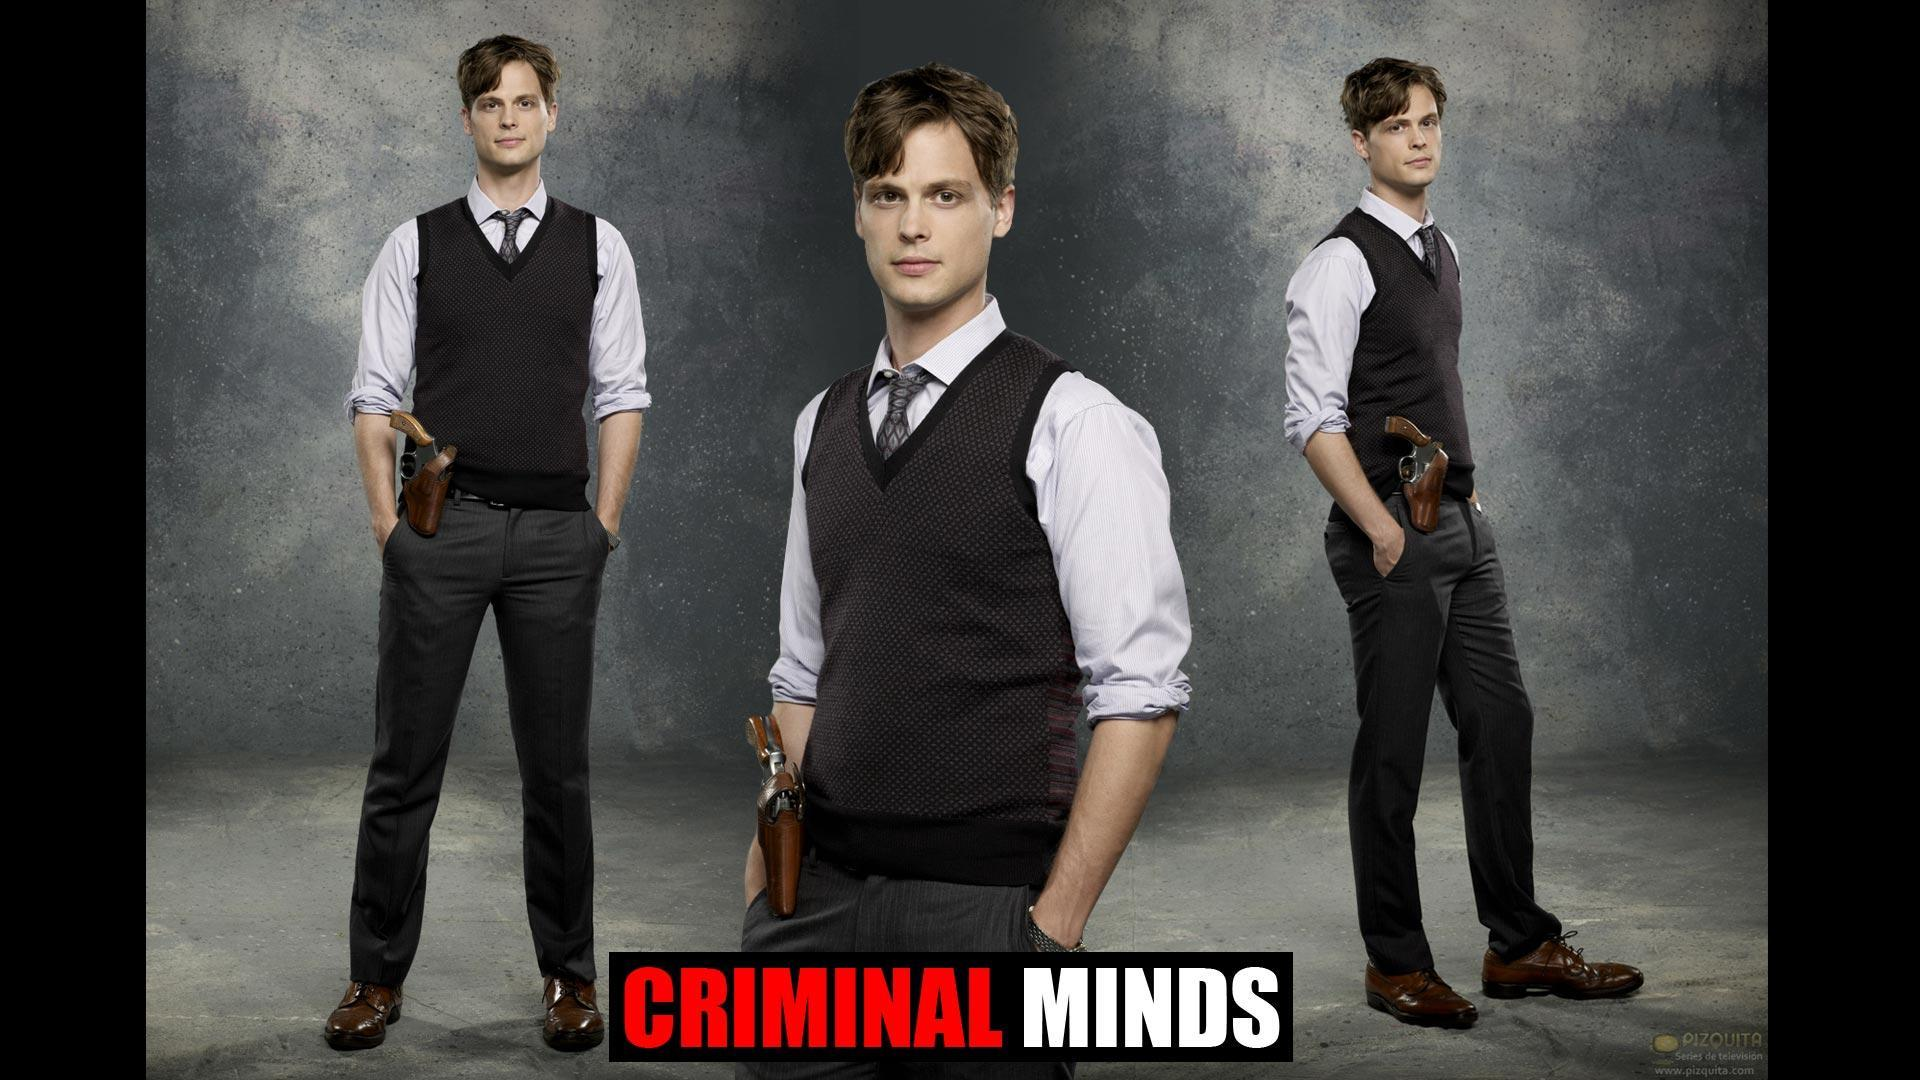 criminal minds wallpapers wallpaper cave